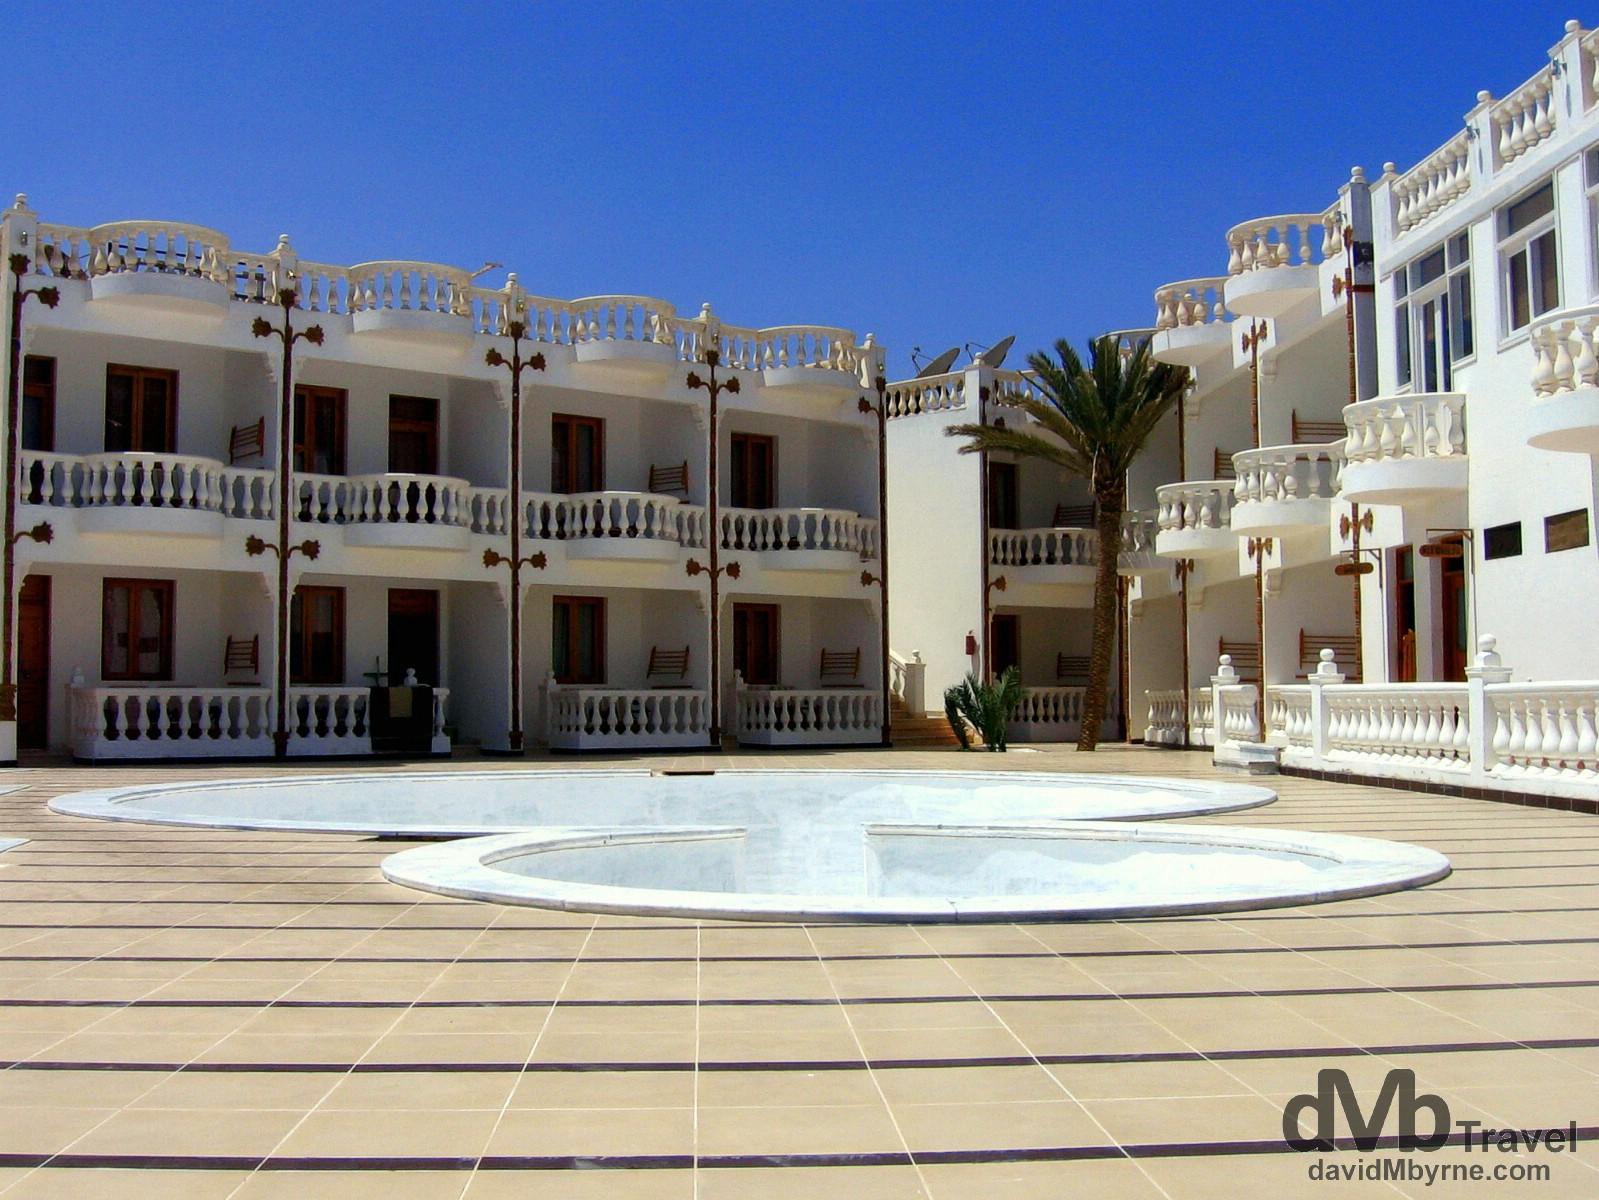 New accommodations in Dahab on the Sinai Peninsula, Egypt. April 19, 2008.